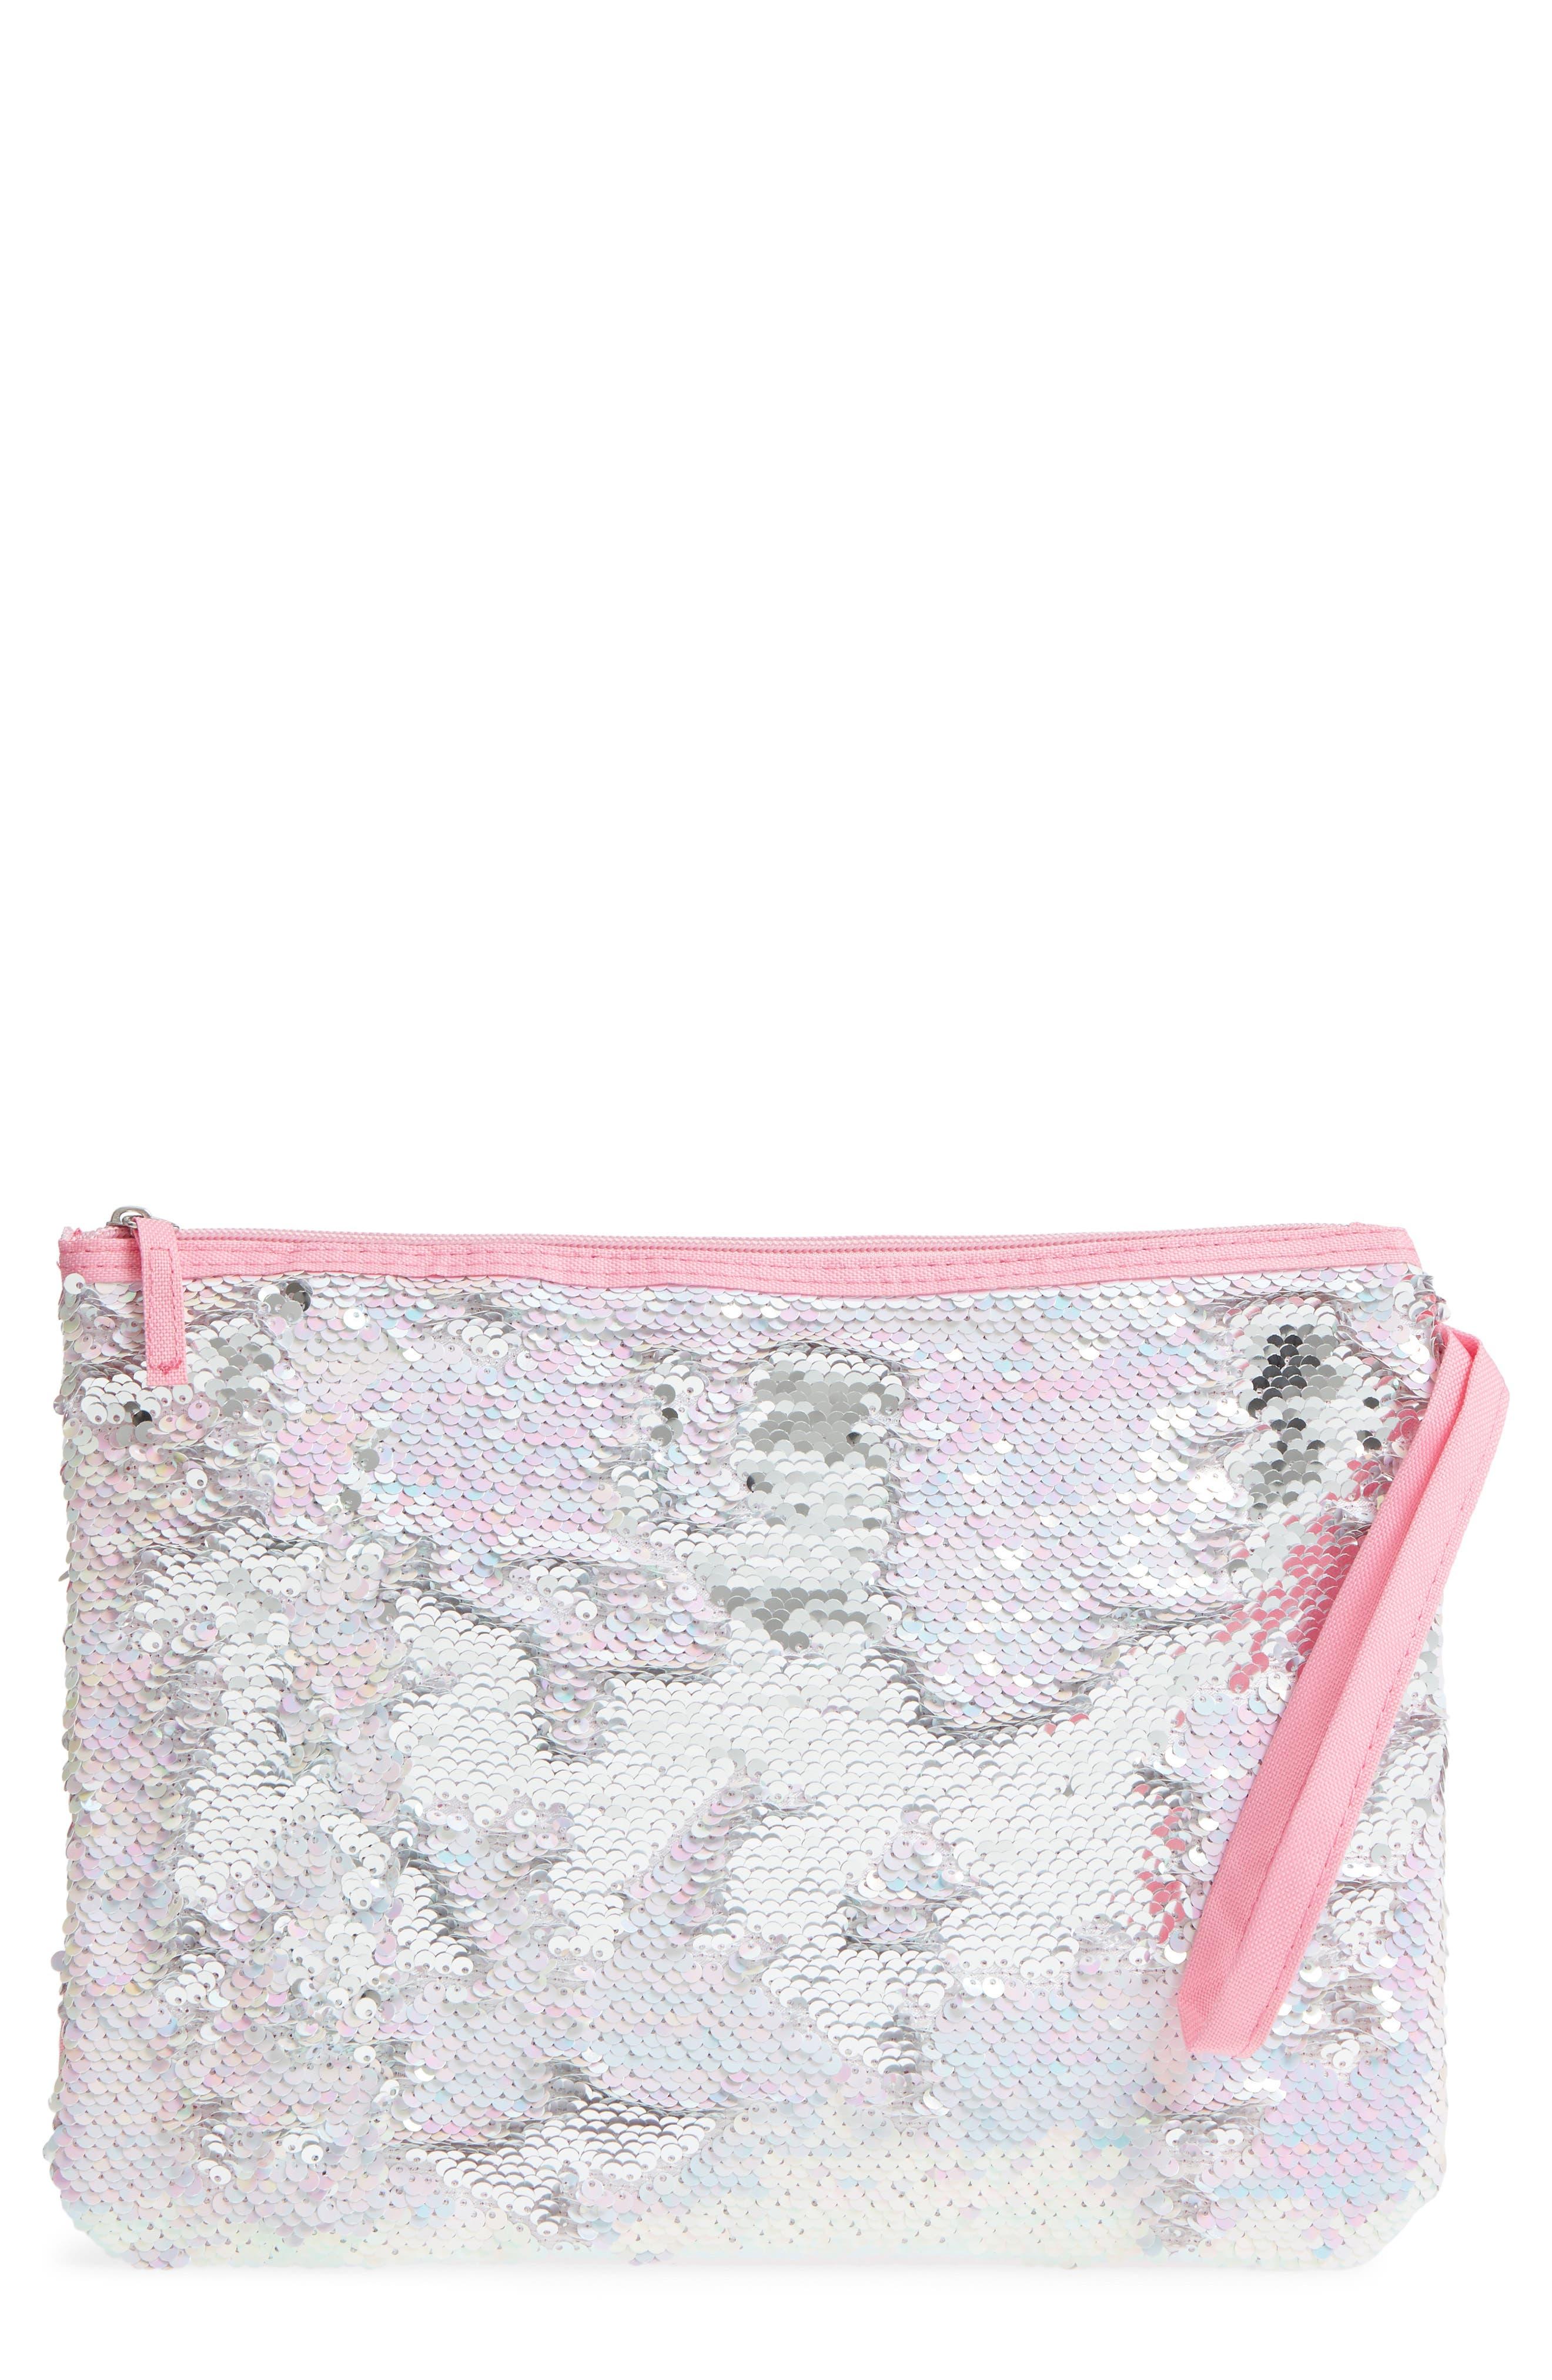 Sequin Bikini Bag,                         Main,                         color, 650